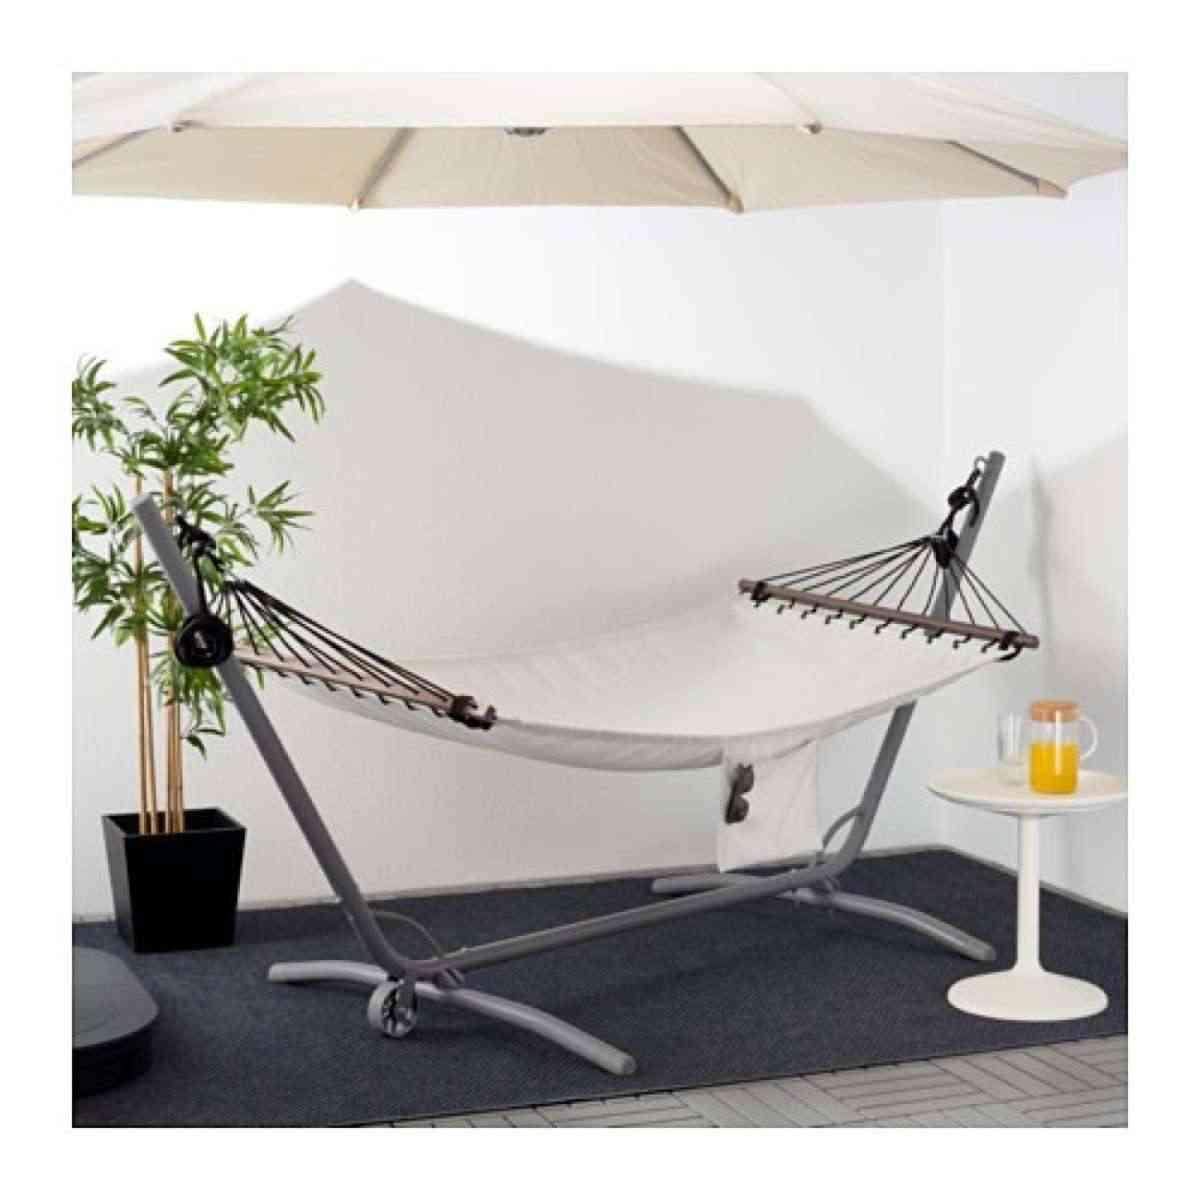 hamacs Ikea